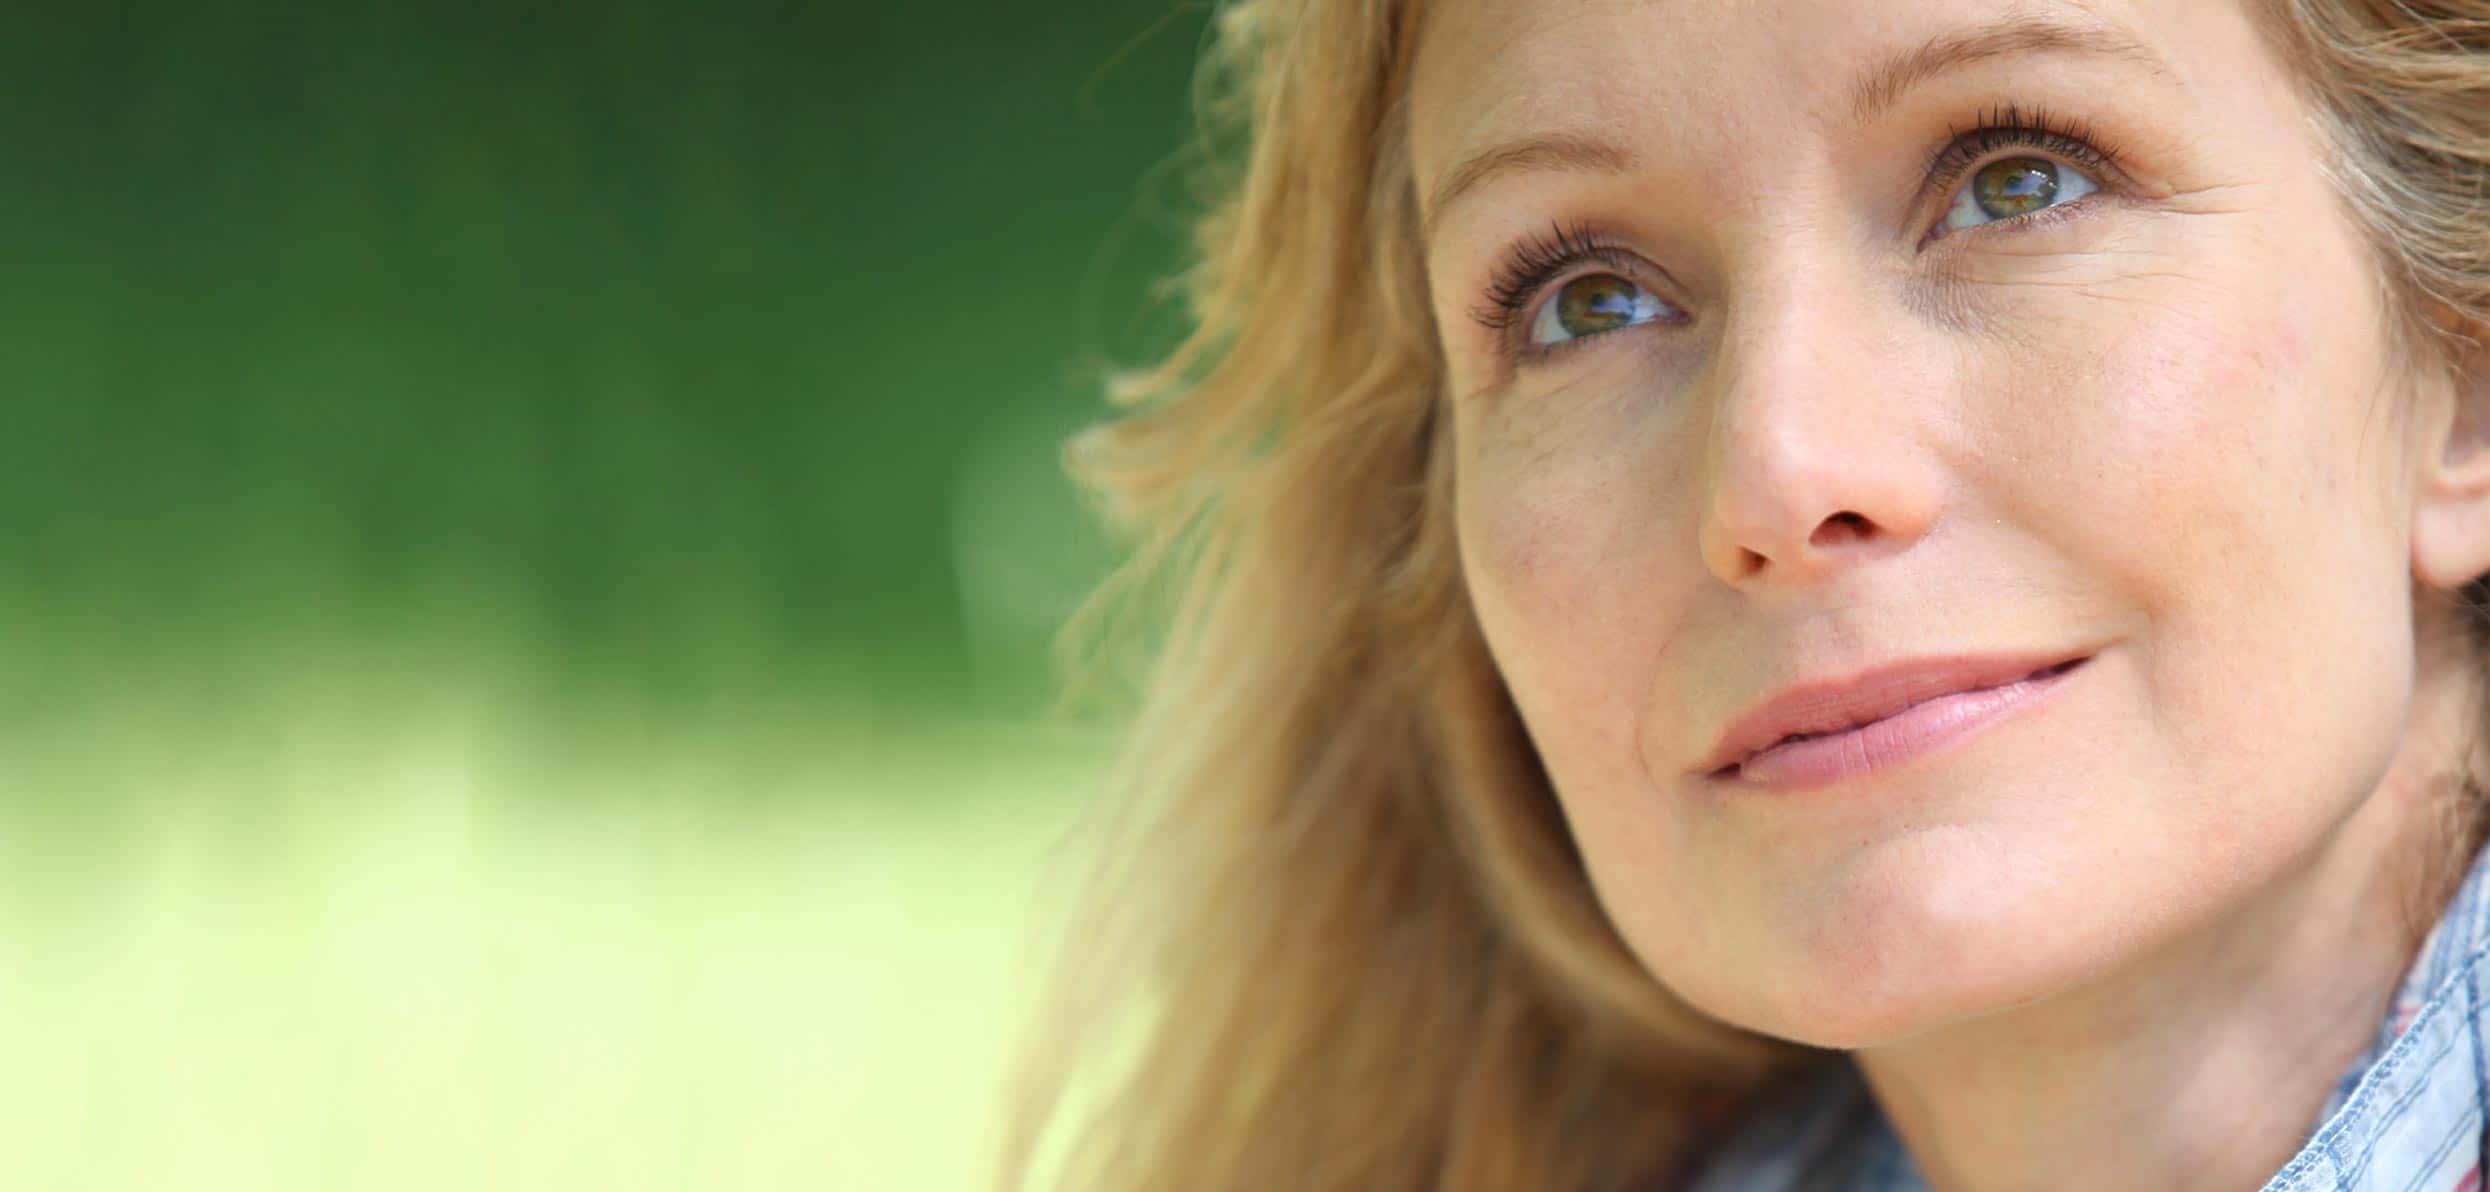 closeup of a woman happily looking upwards - women's health initiative